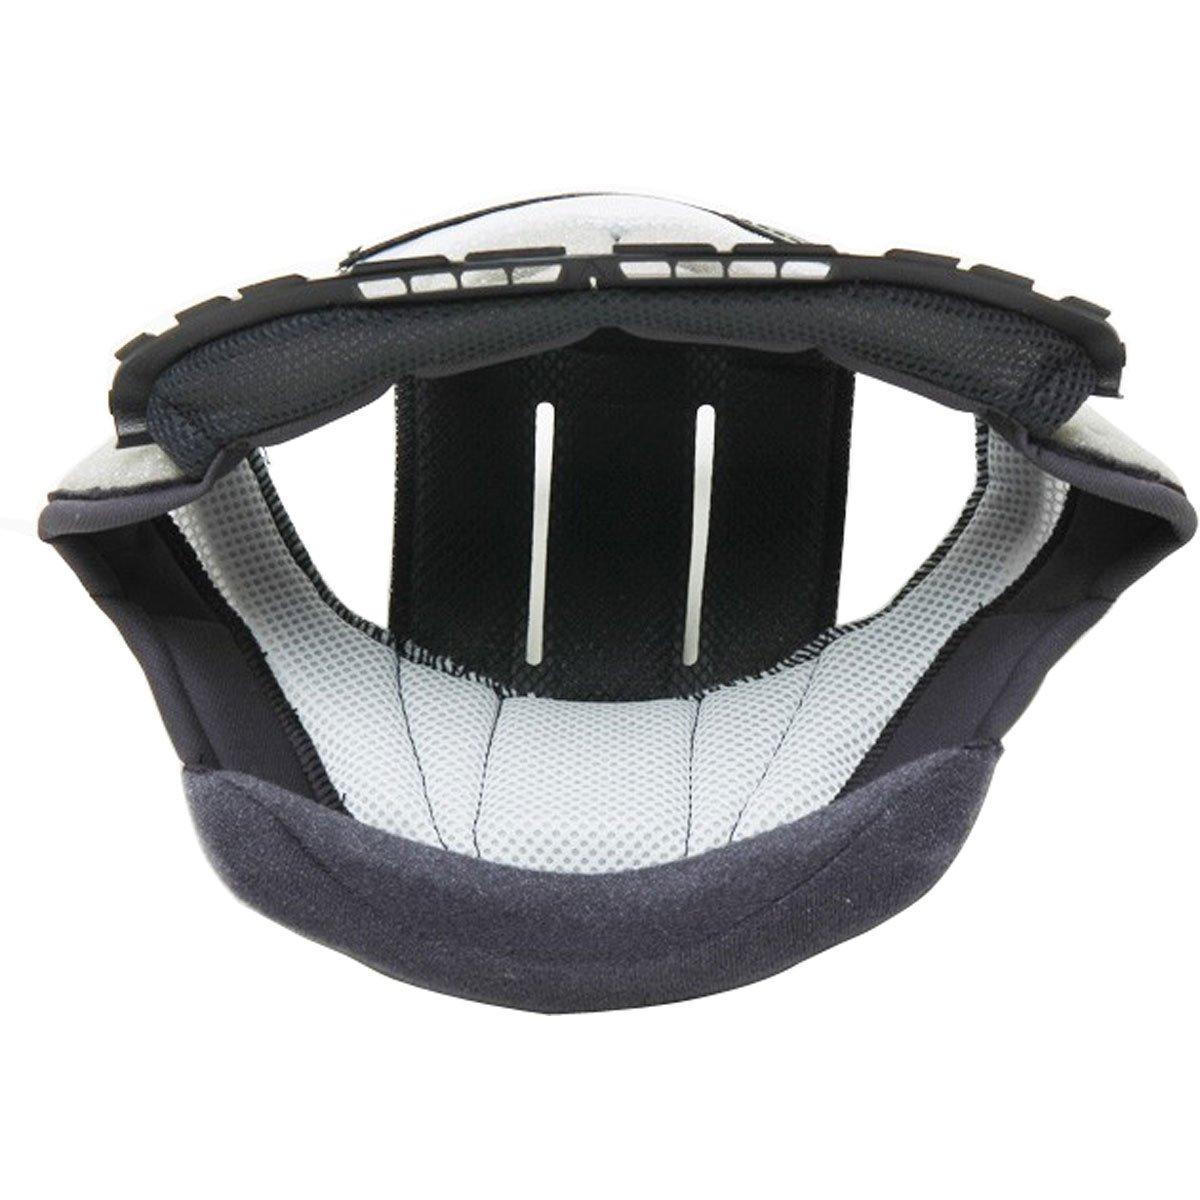 Shoei X-Twelve Center Pad L9 Street Motorcycle Helmet Accessories - Grey/Large